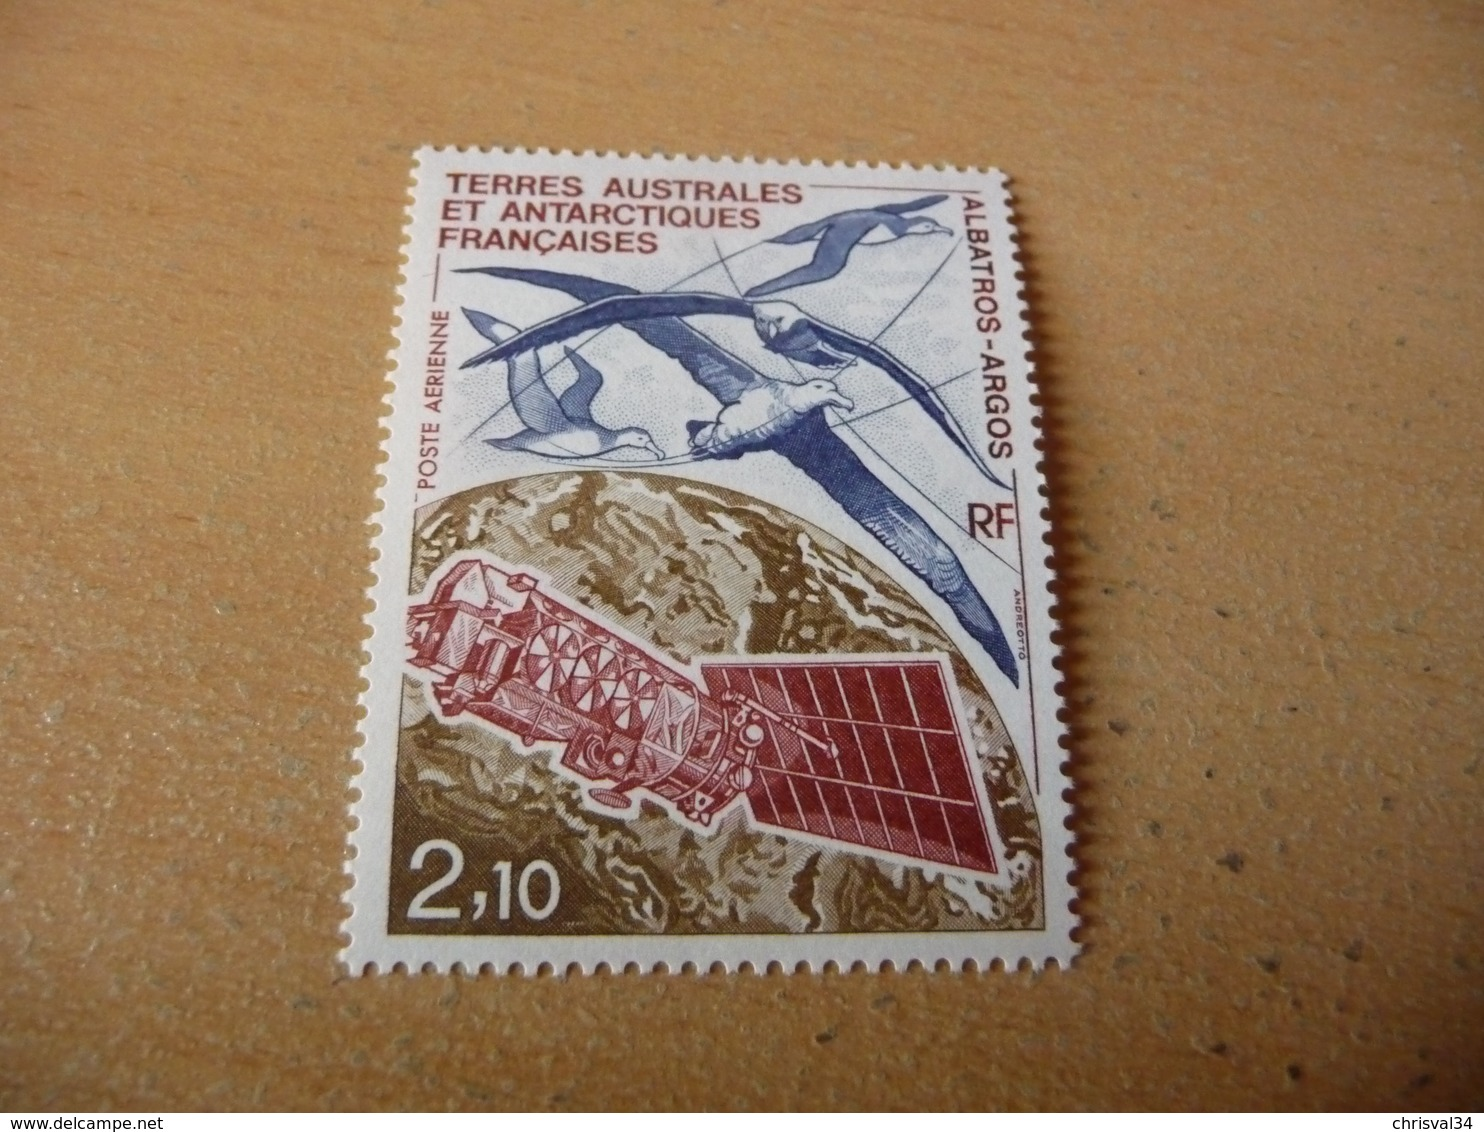 TIMBRE  POSTE  AÉRIENNE   TAAF   N  115   COTE 1,30  EUROS    NEUF  LUXE**   ANNÉE   1991 - Luchtpost